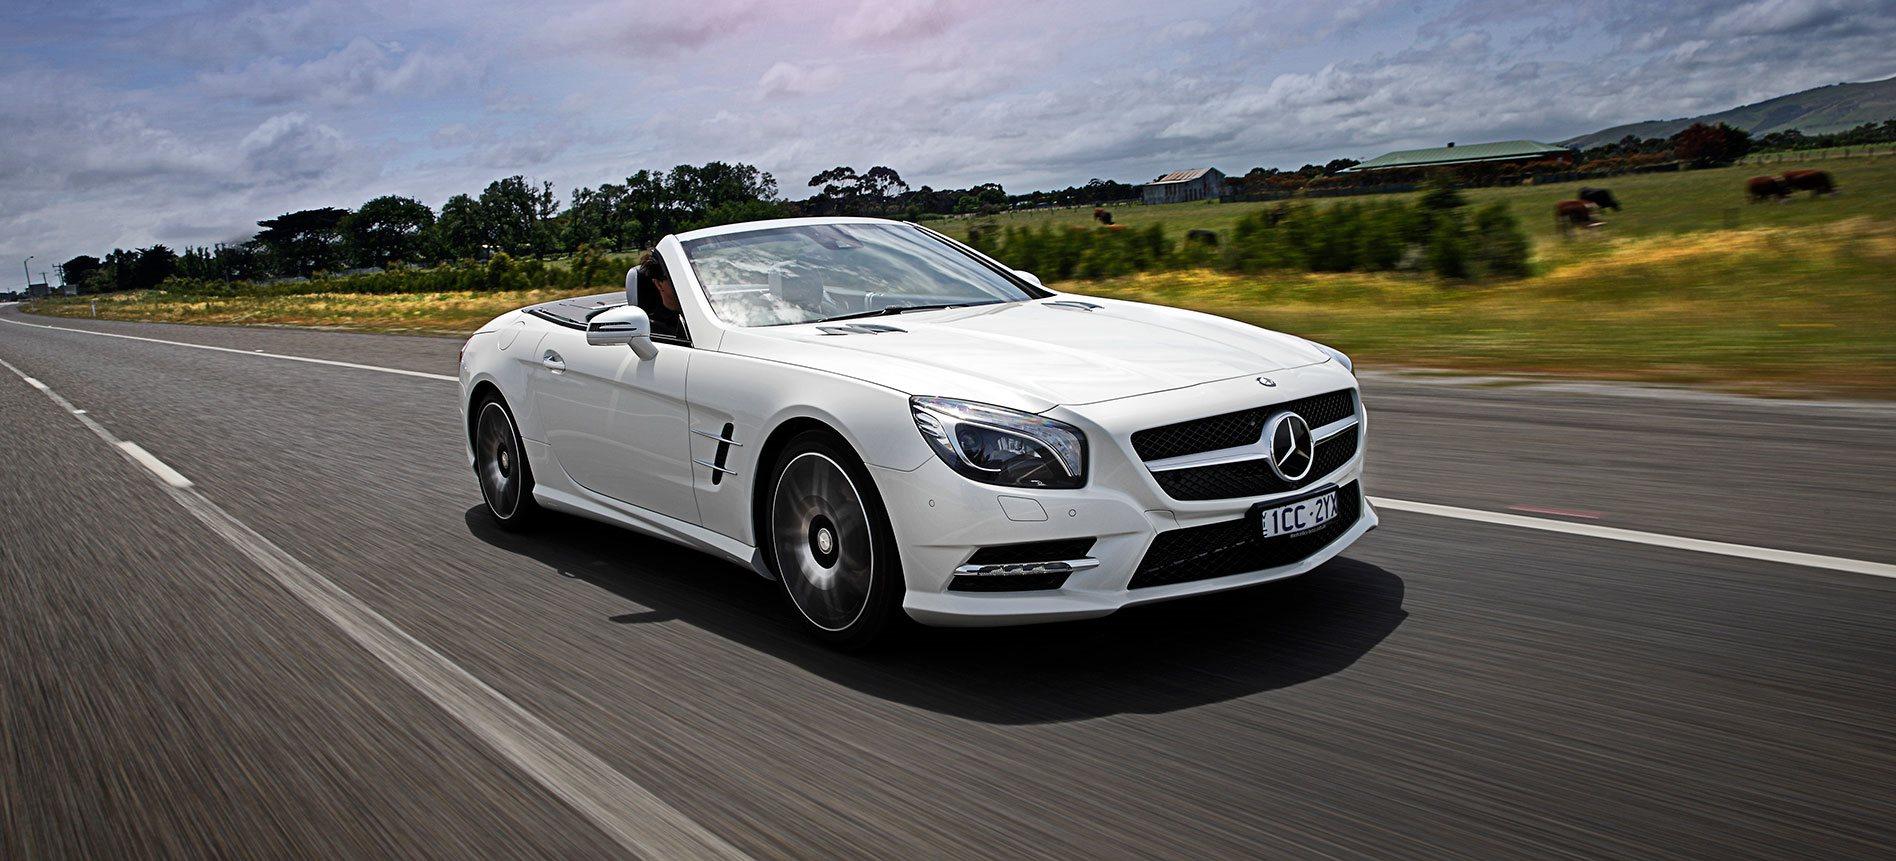 2015 mercedes benz sl400 review wheels for Mercedes benz sl400